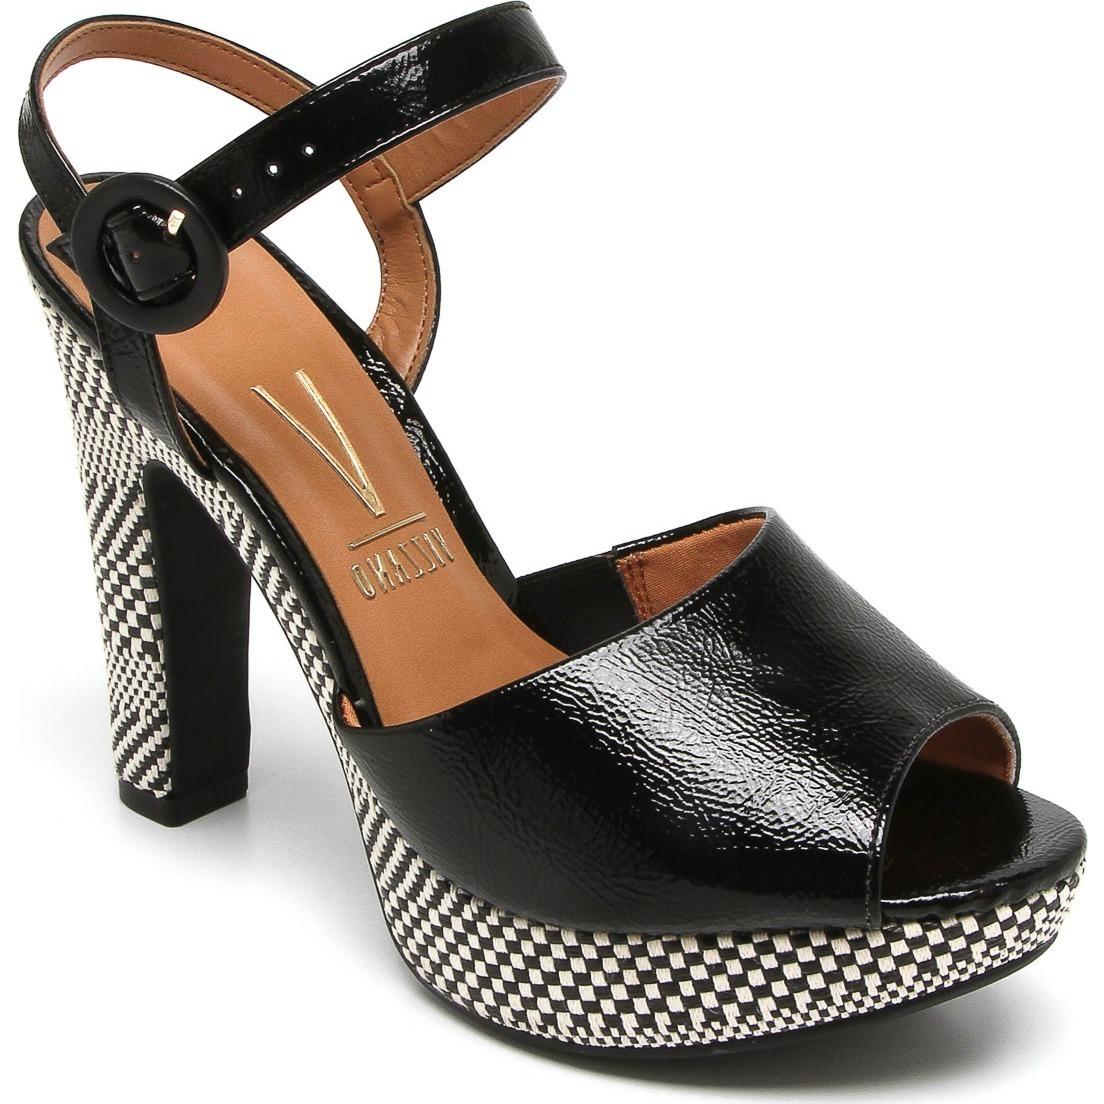 5350ad1904 sandália feminina vizzano meia pata verniz glam 6292123. Carregando zoom.